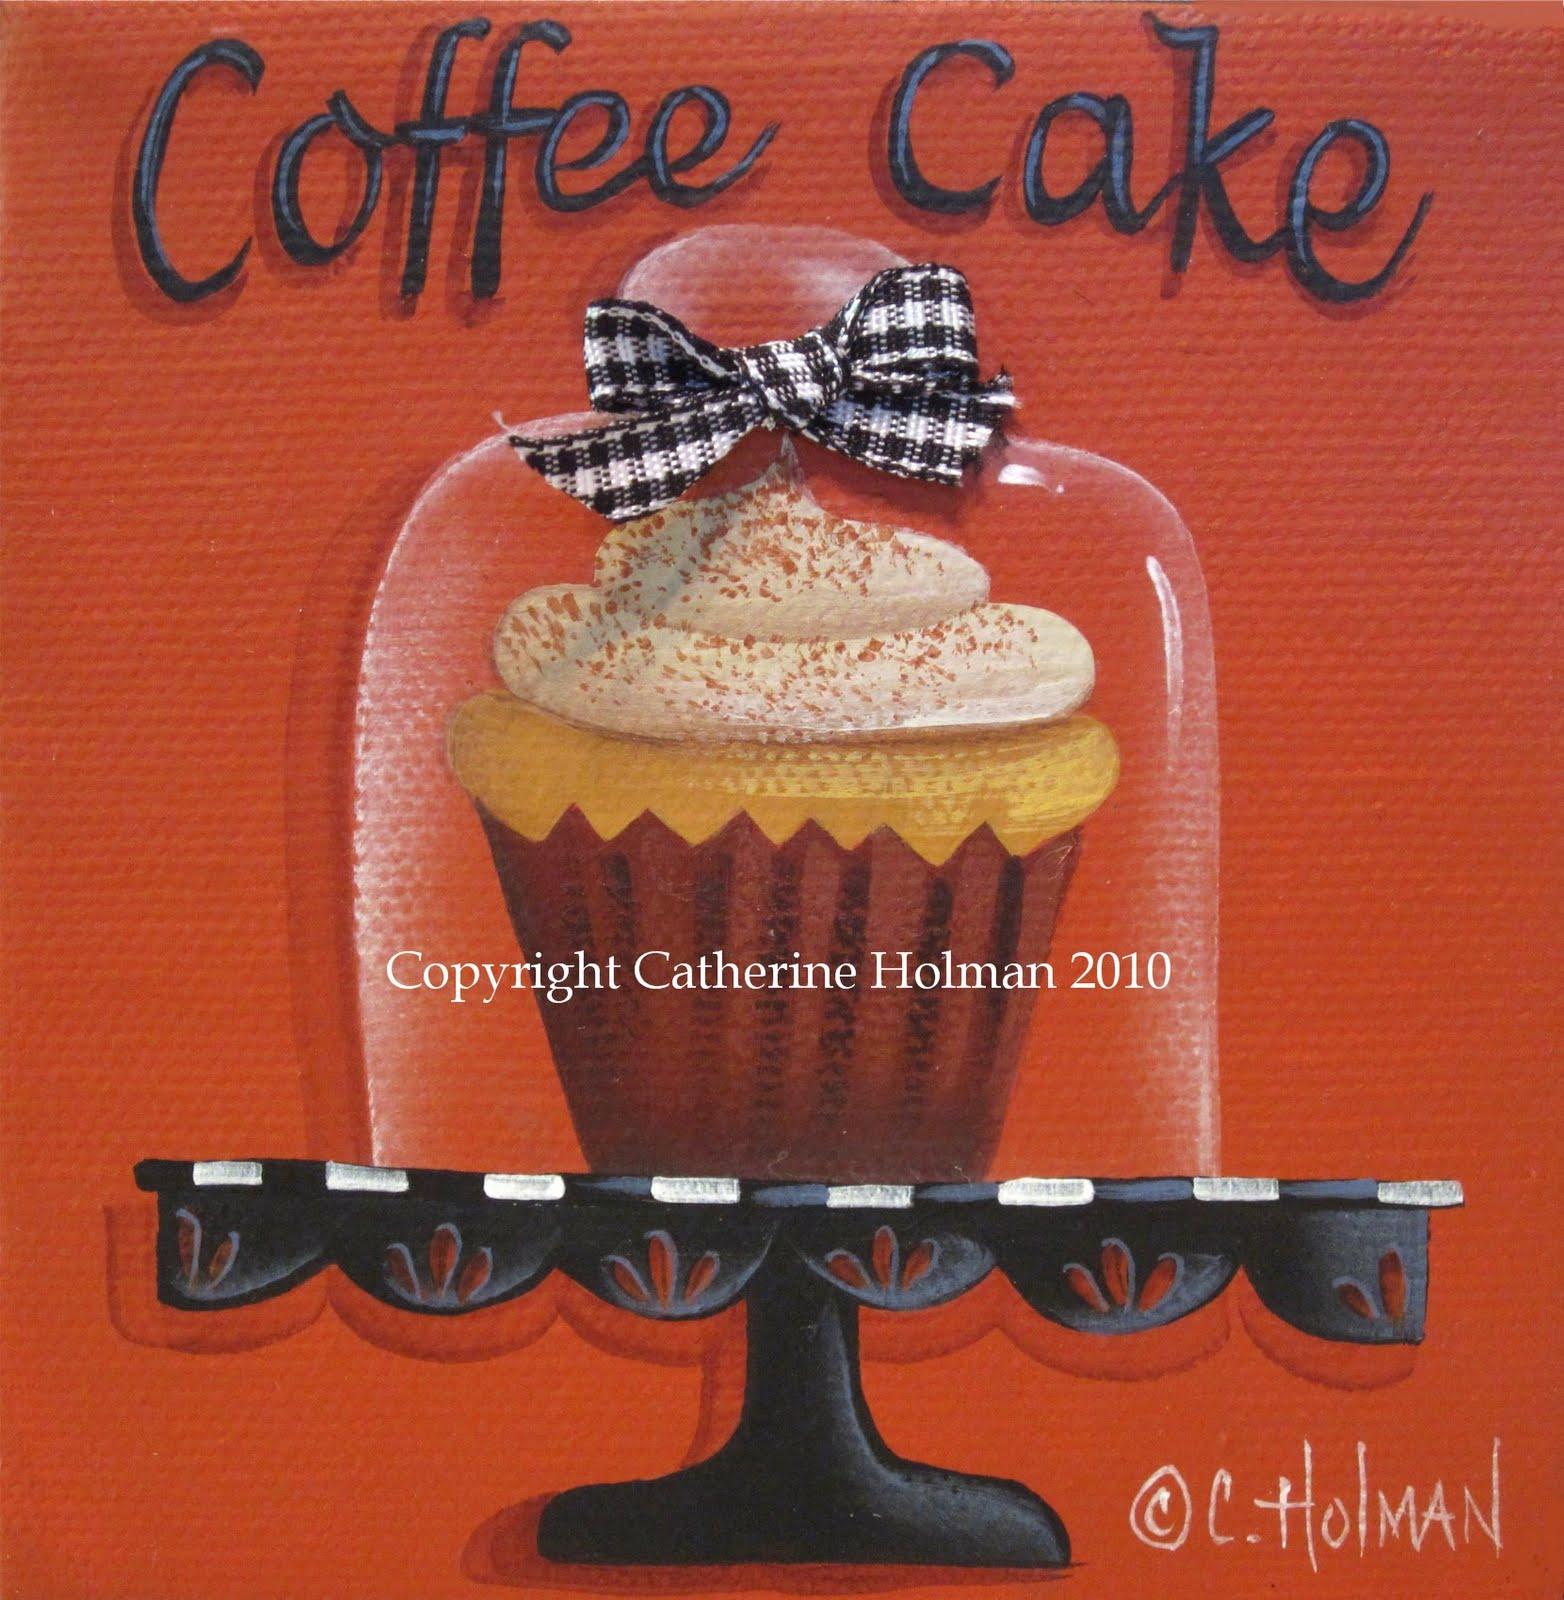 Catherine Holman Folk Art: Coffee Cake Cupcake New Print